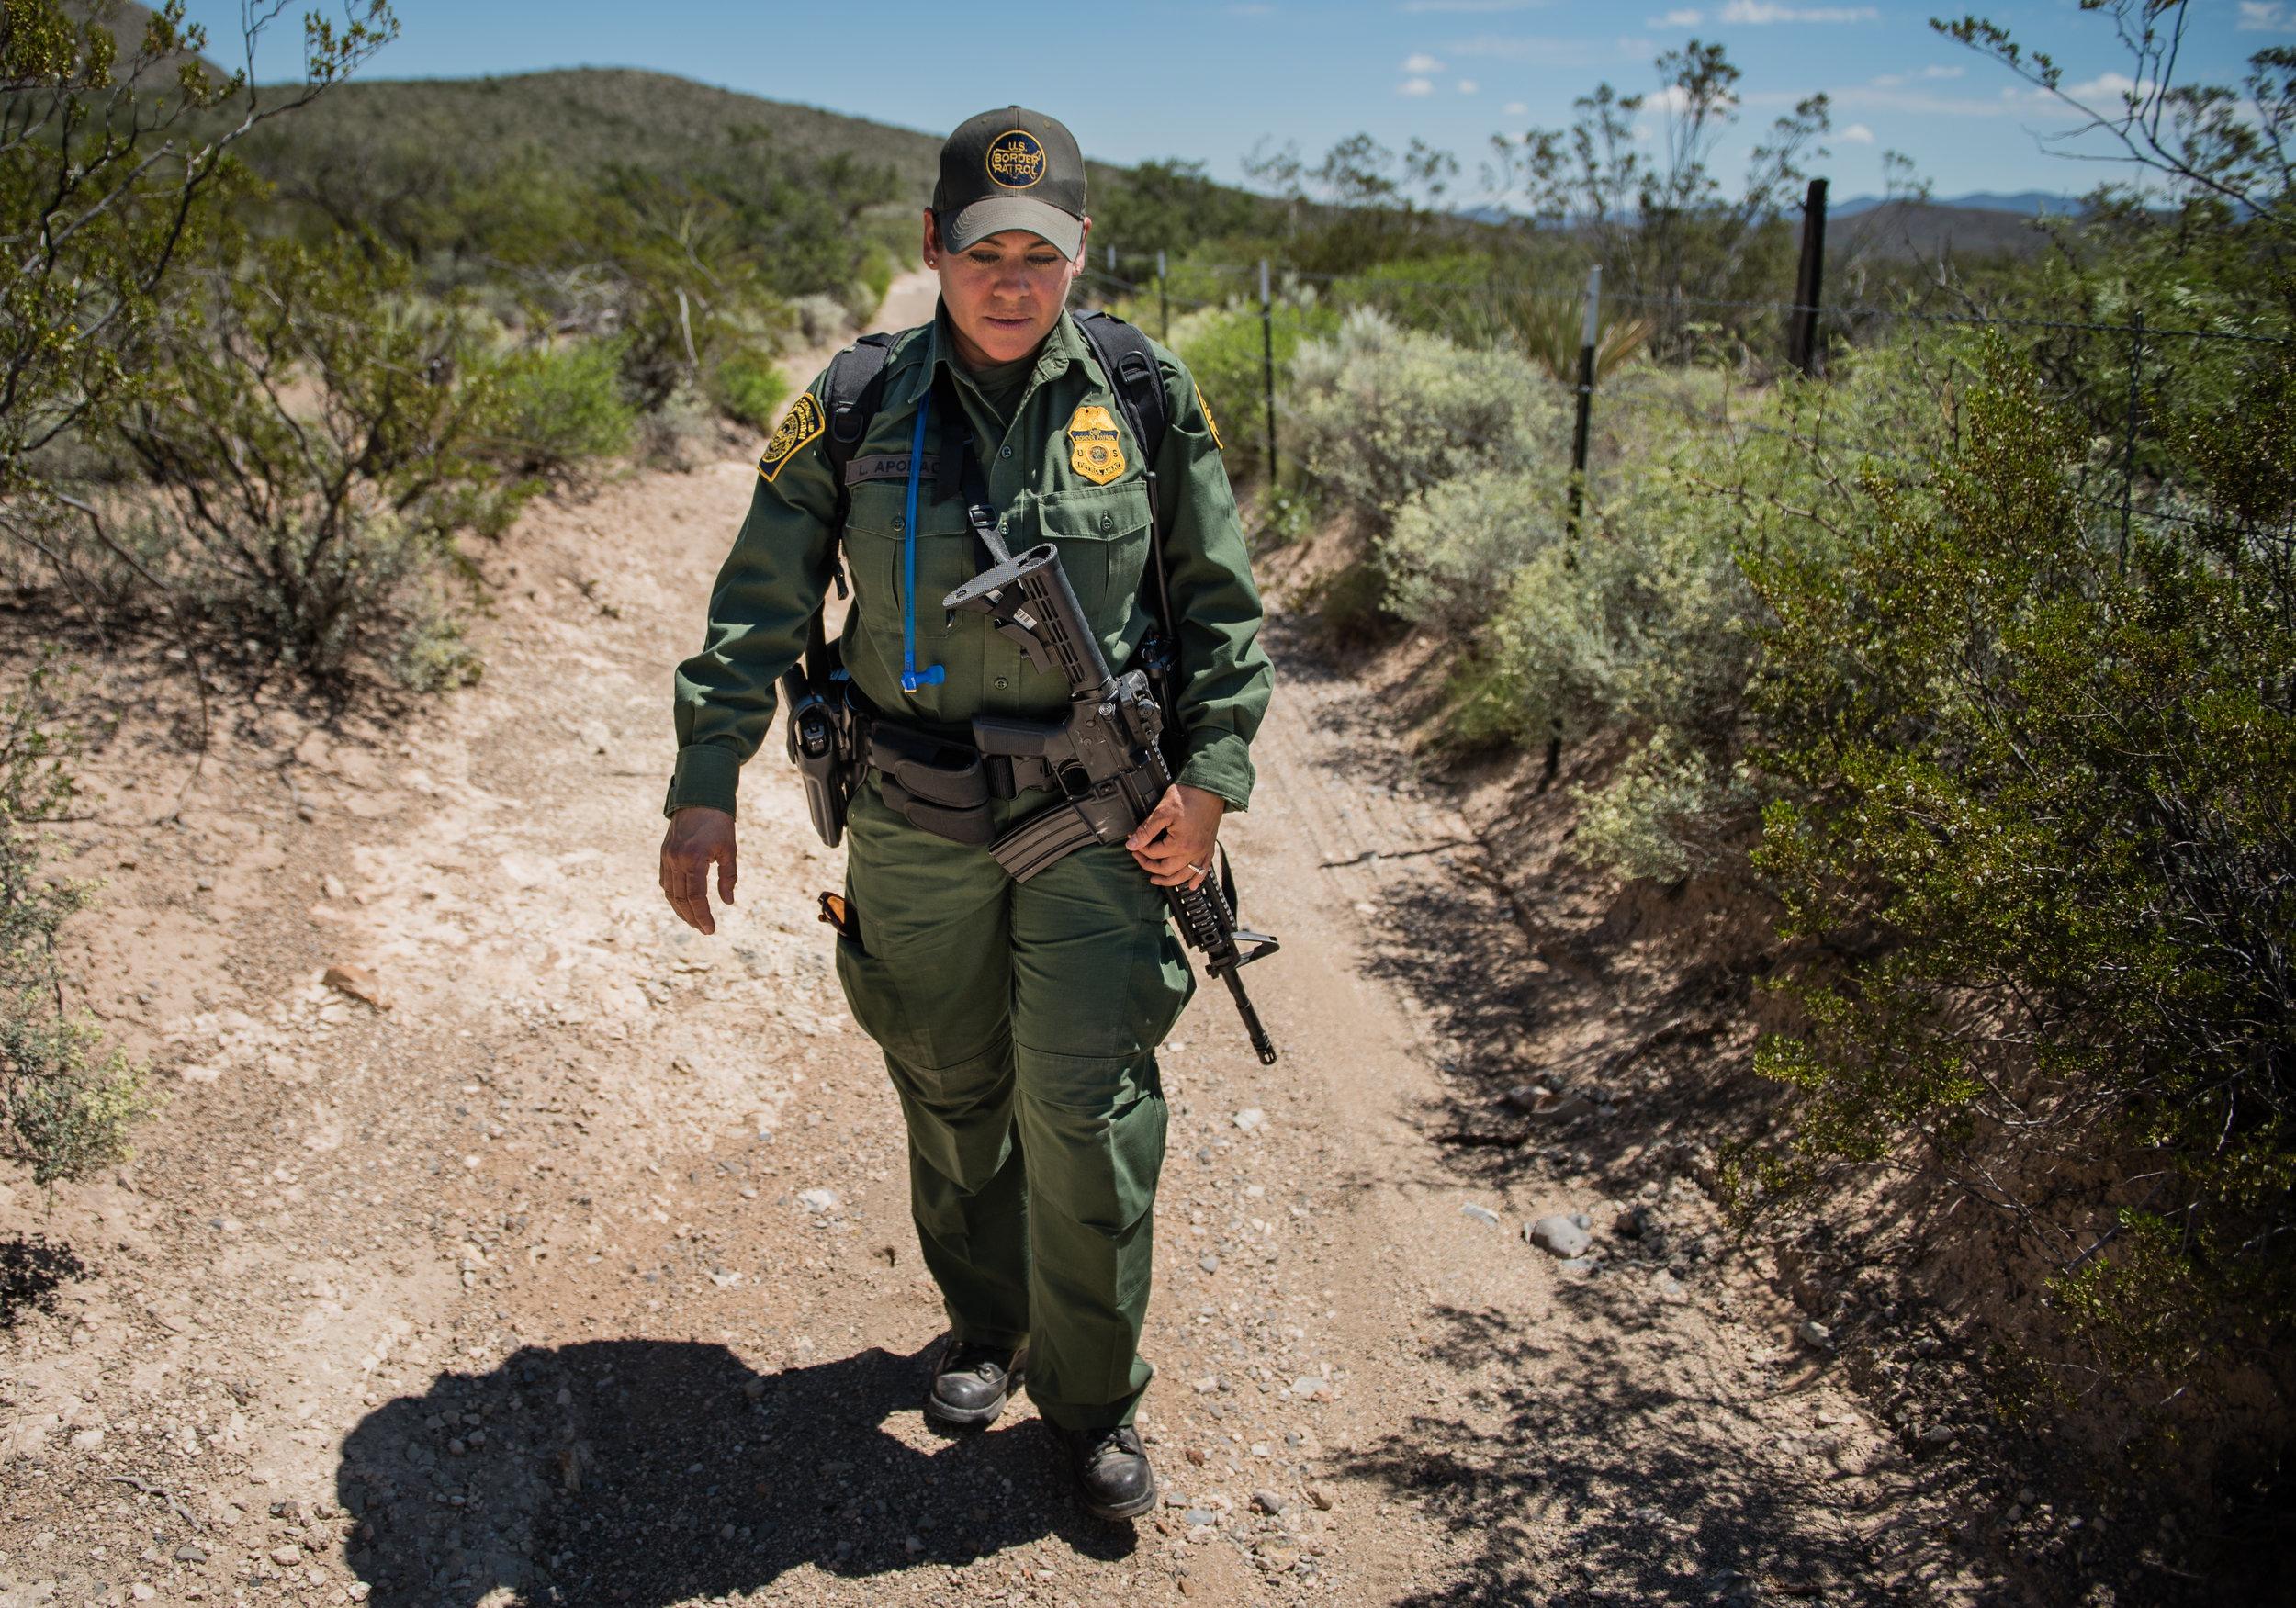 rer border patrol.JPG